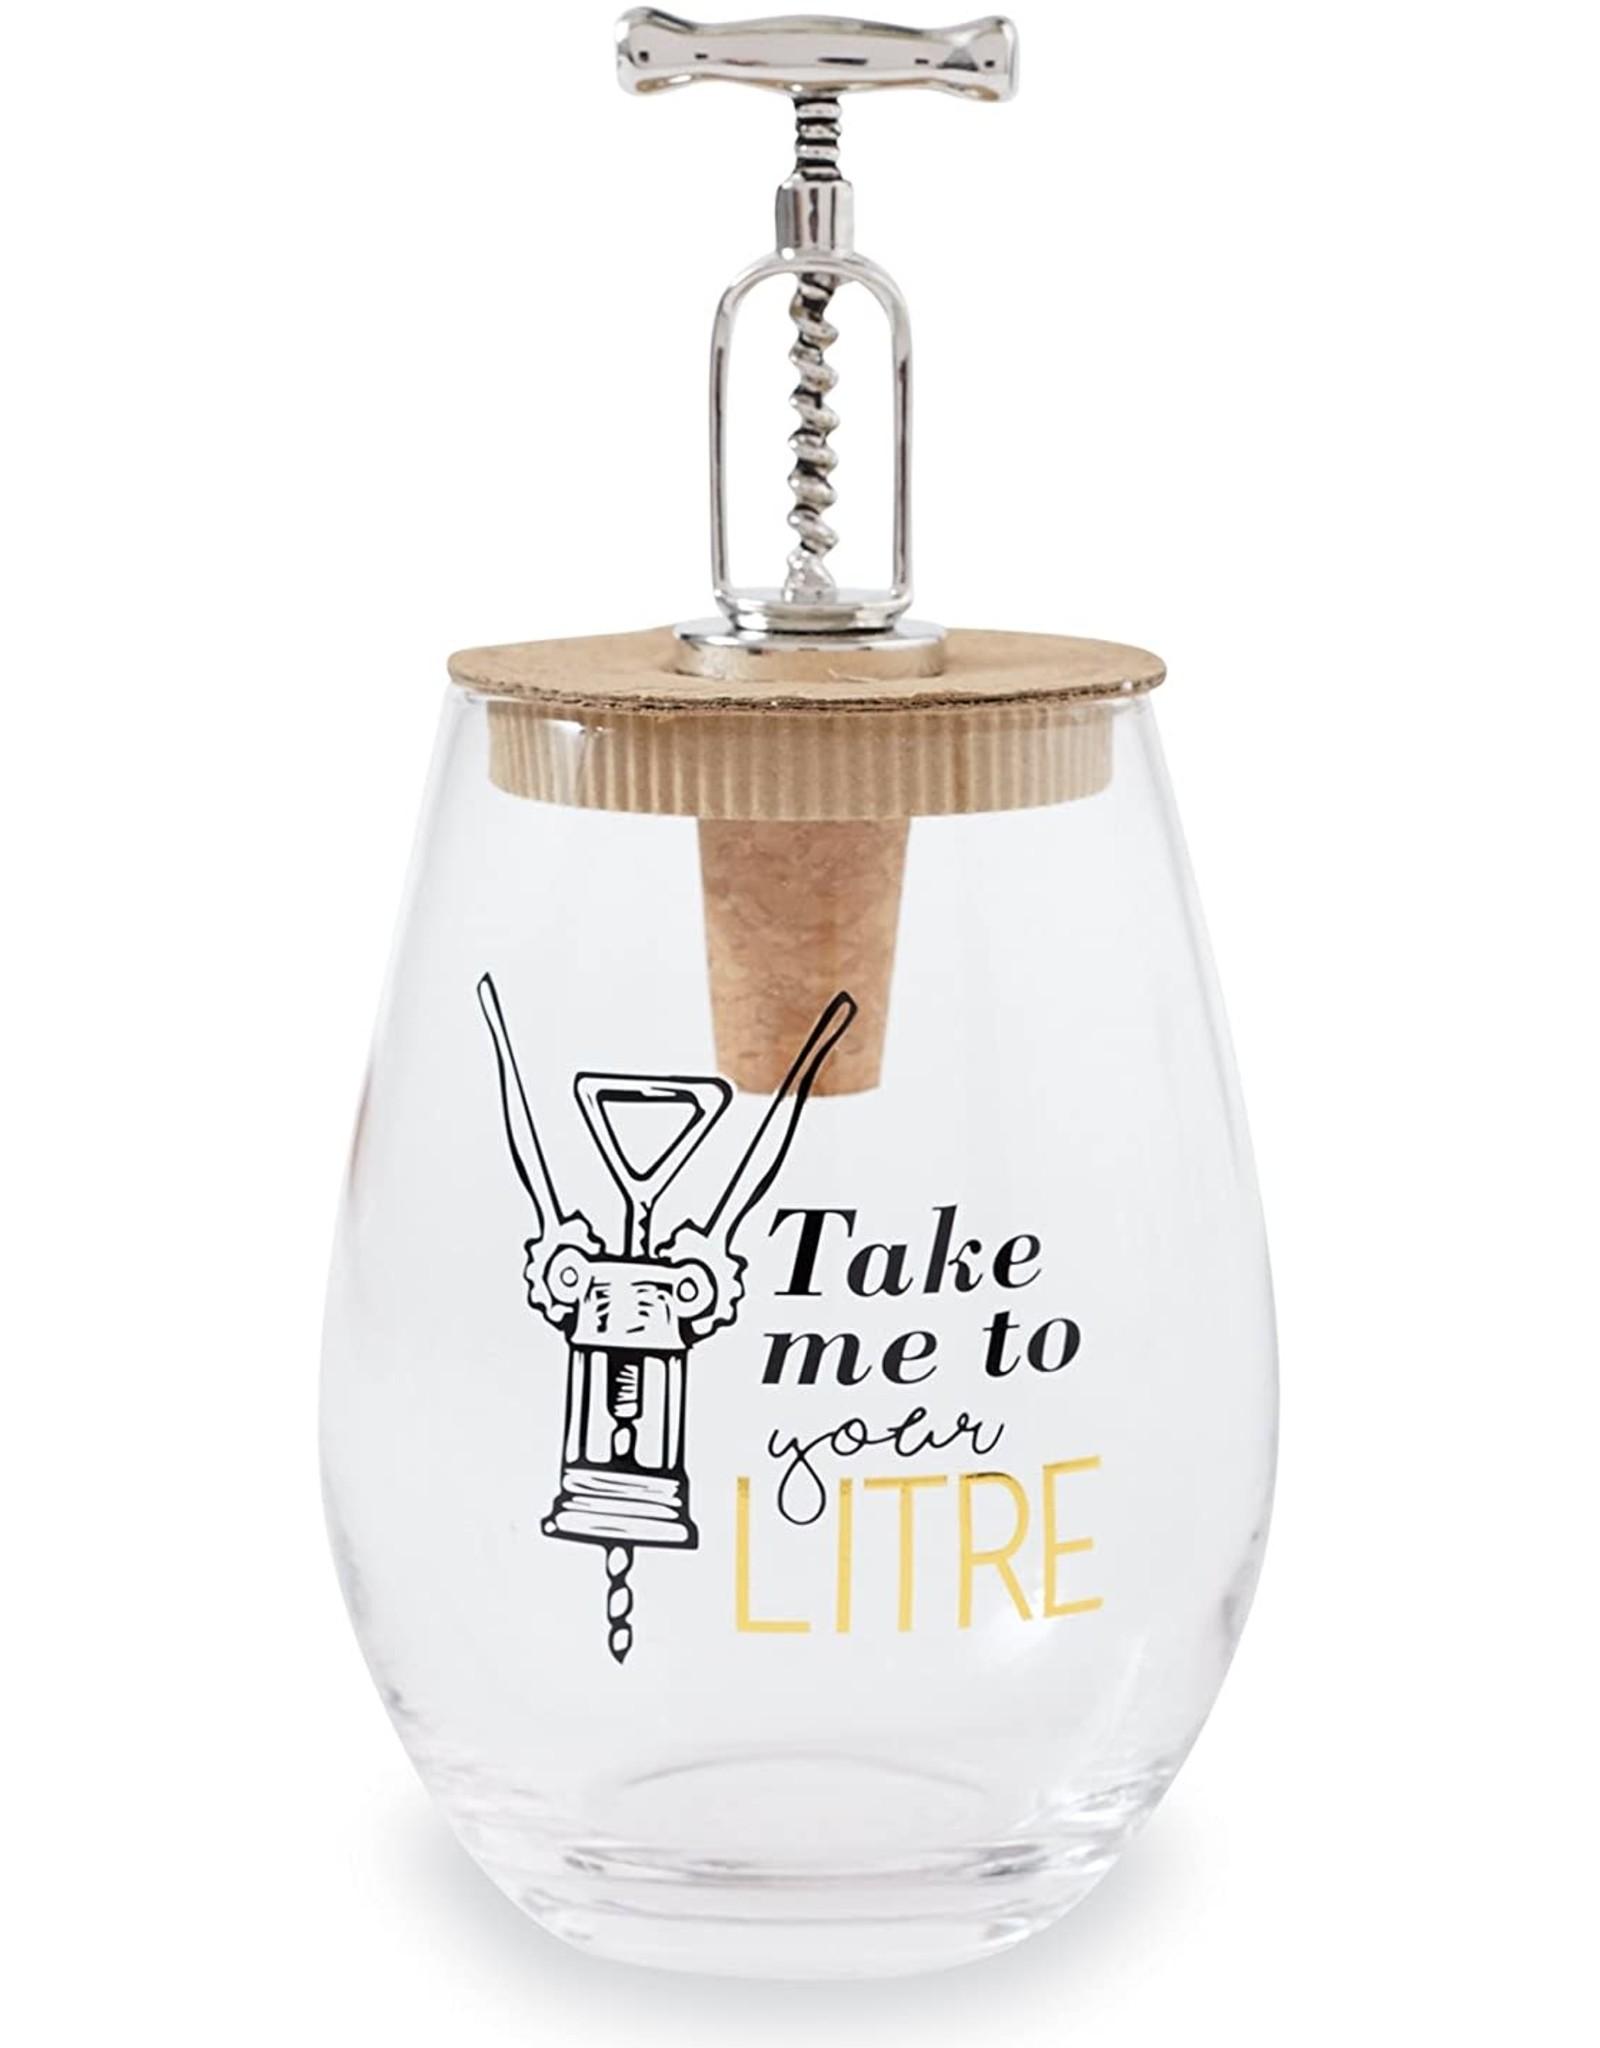 Mudpie Litre Corkscrew Wine Glass